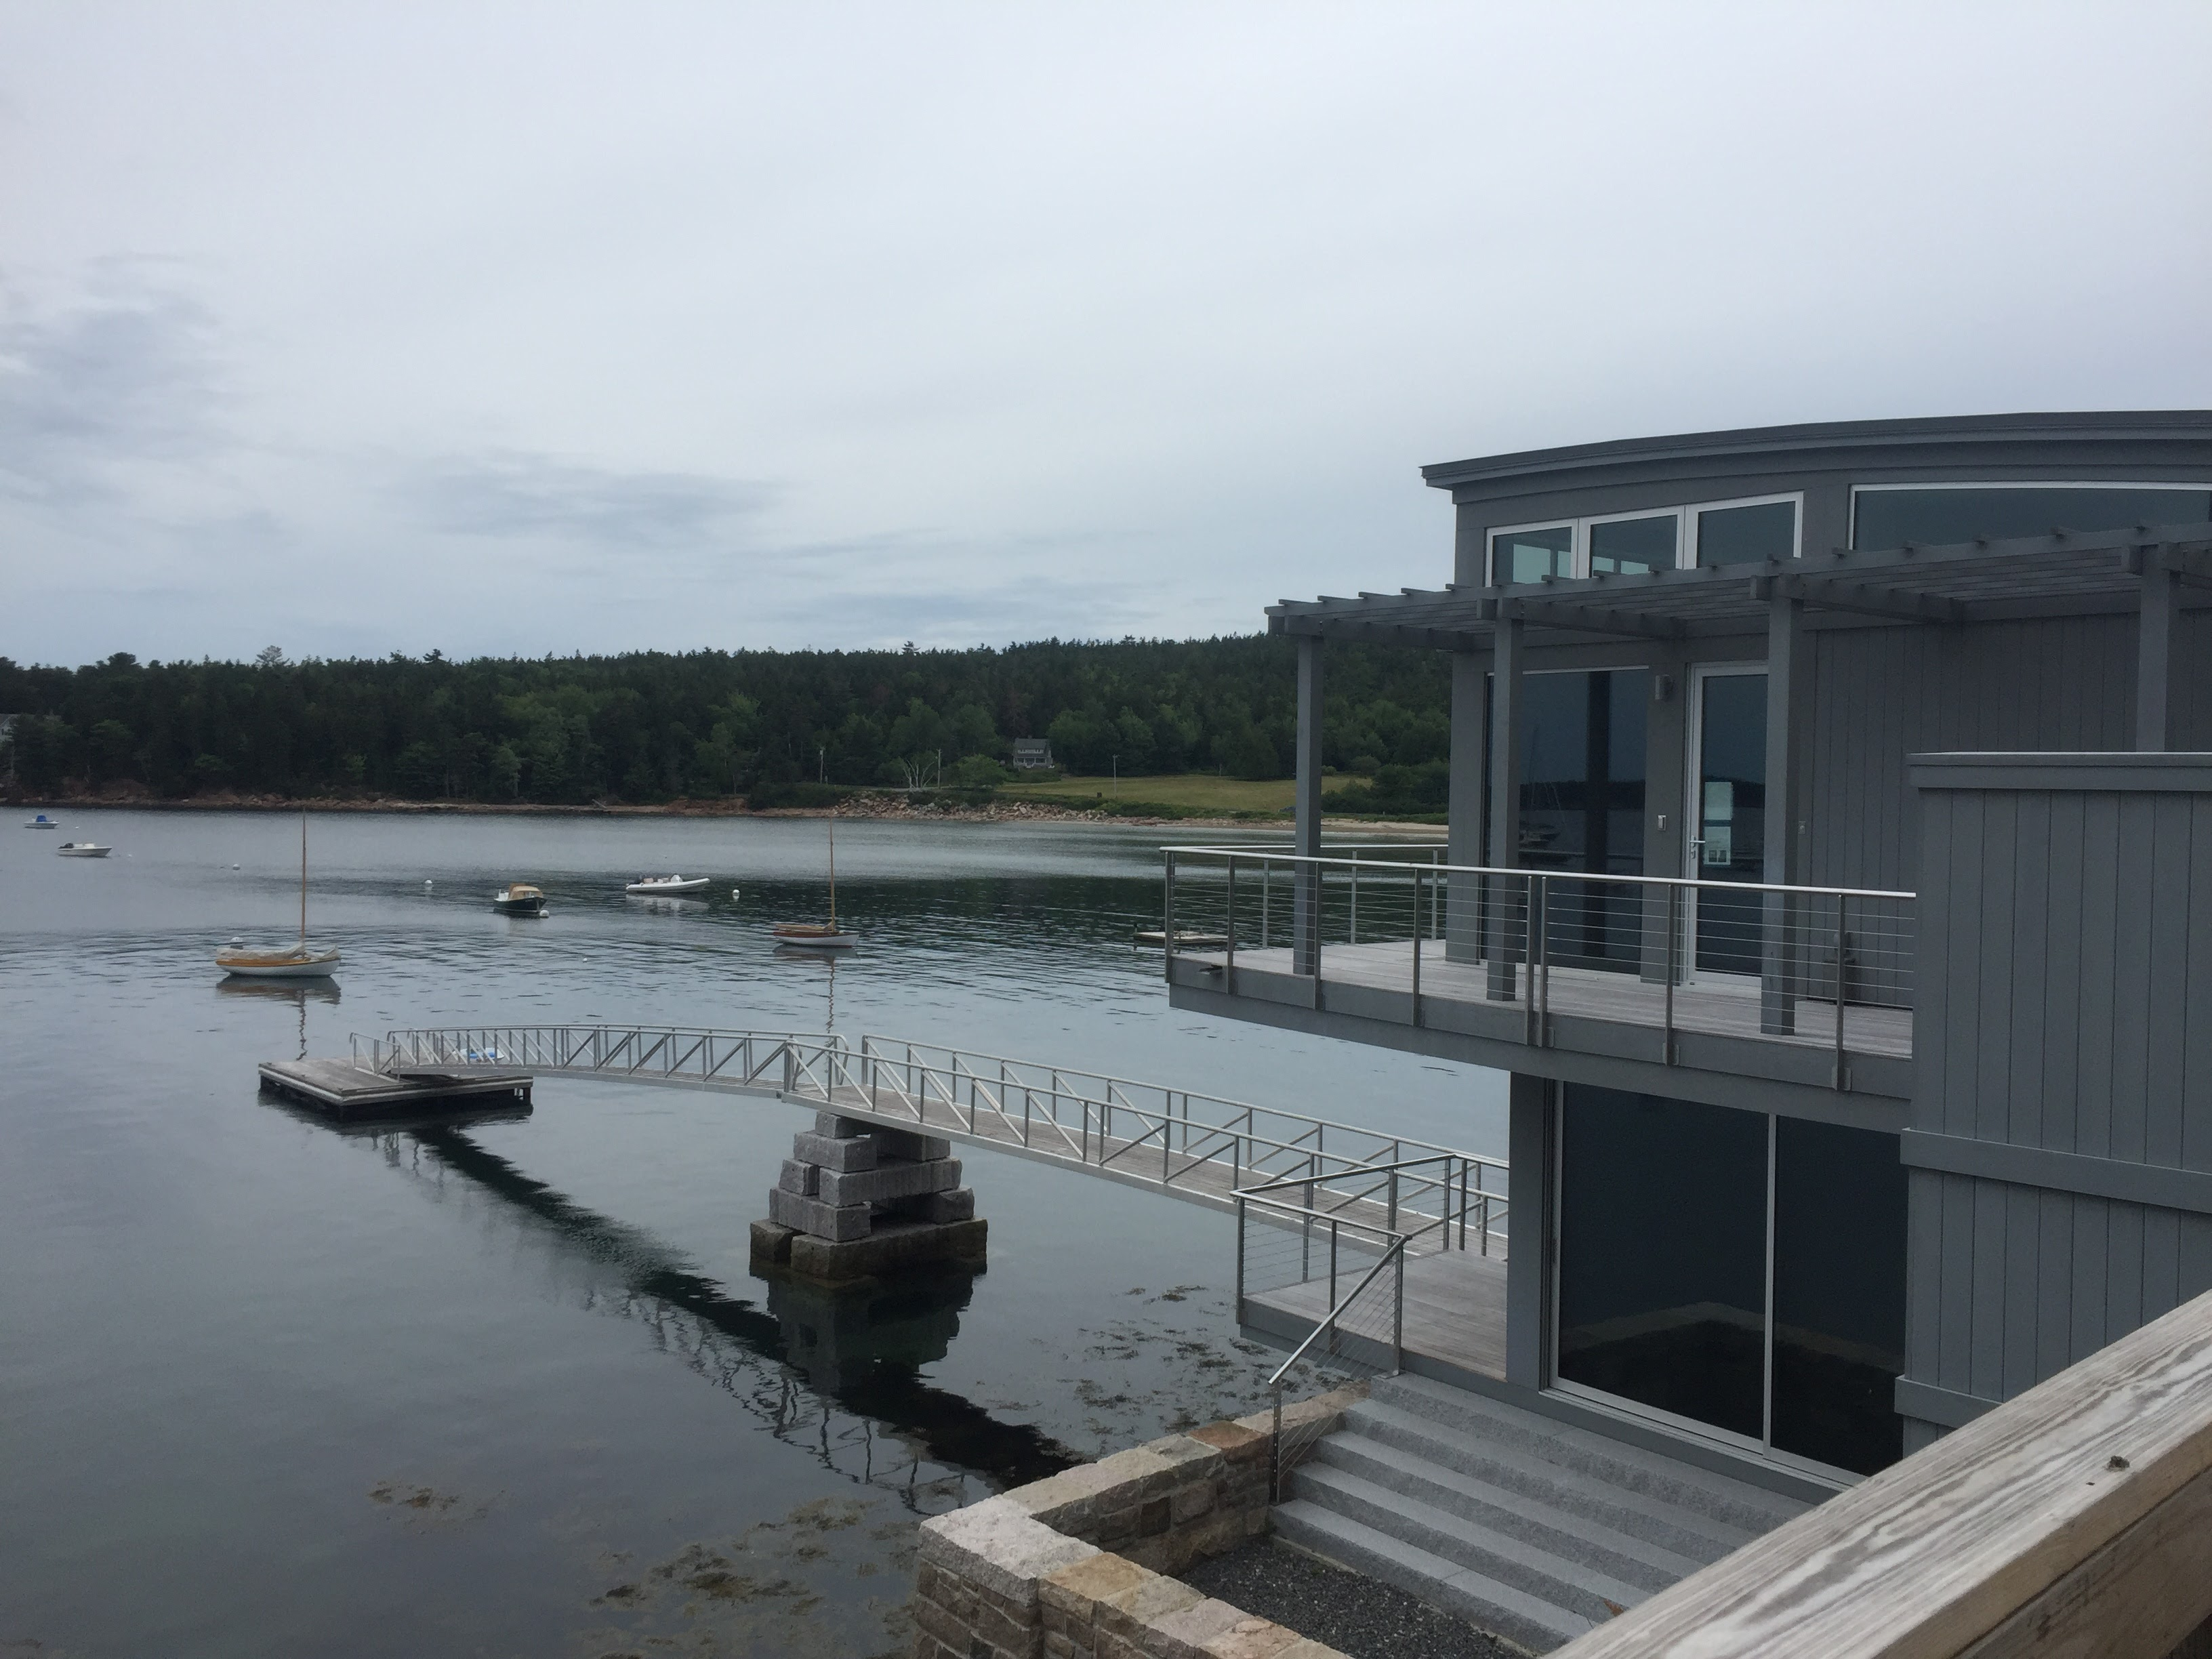 2017-07-24 Seal Harbor 03